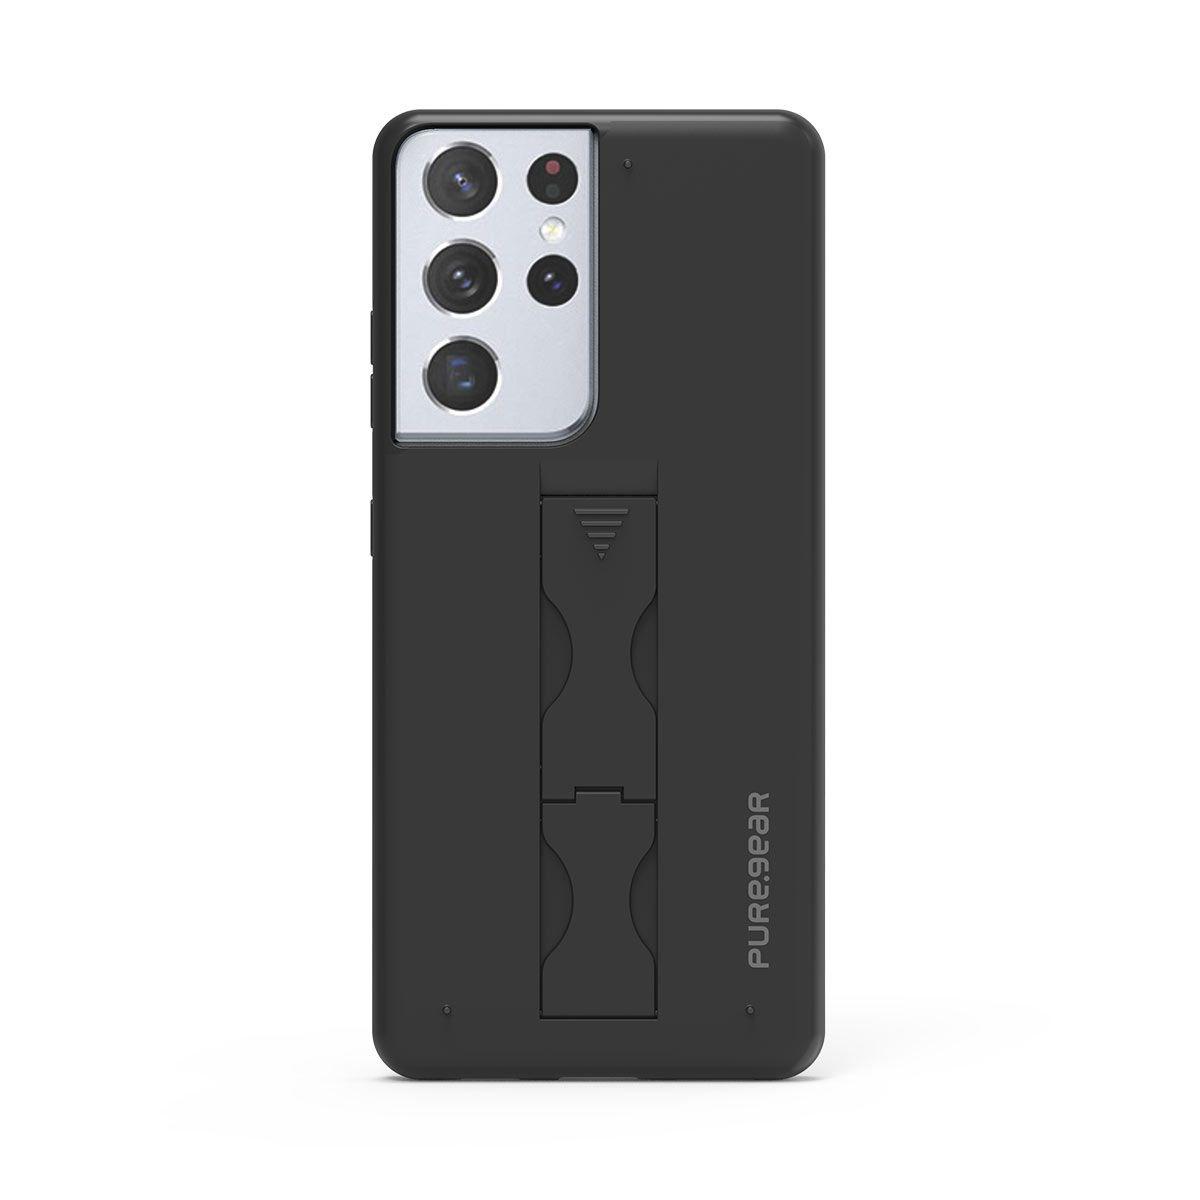 Samsung Galaxy S21 Ultra 5G SlimStik, Antimicrobial Kickstand Case – Soft Touch Black